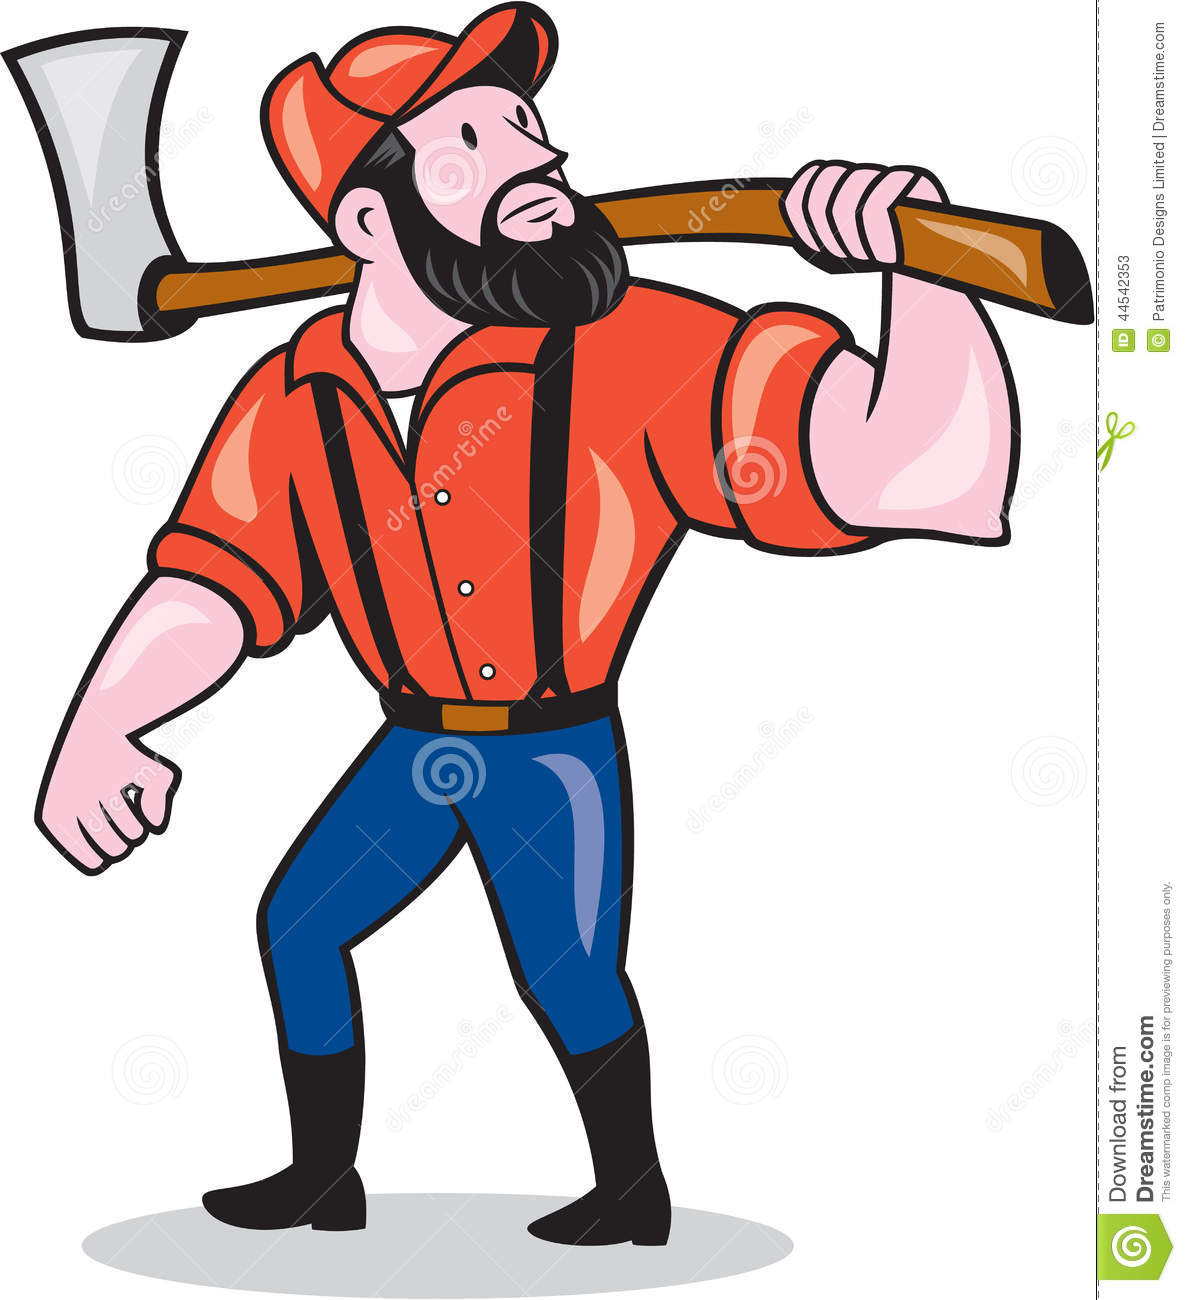 Free lumberjack clipart.